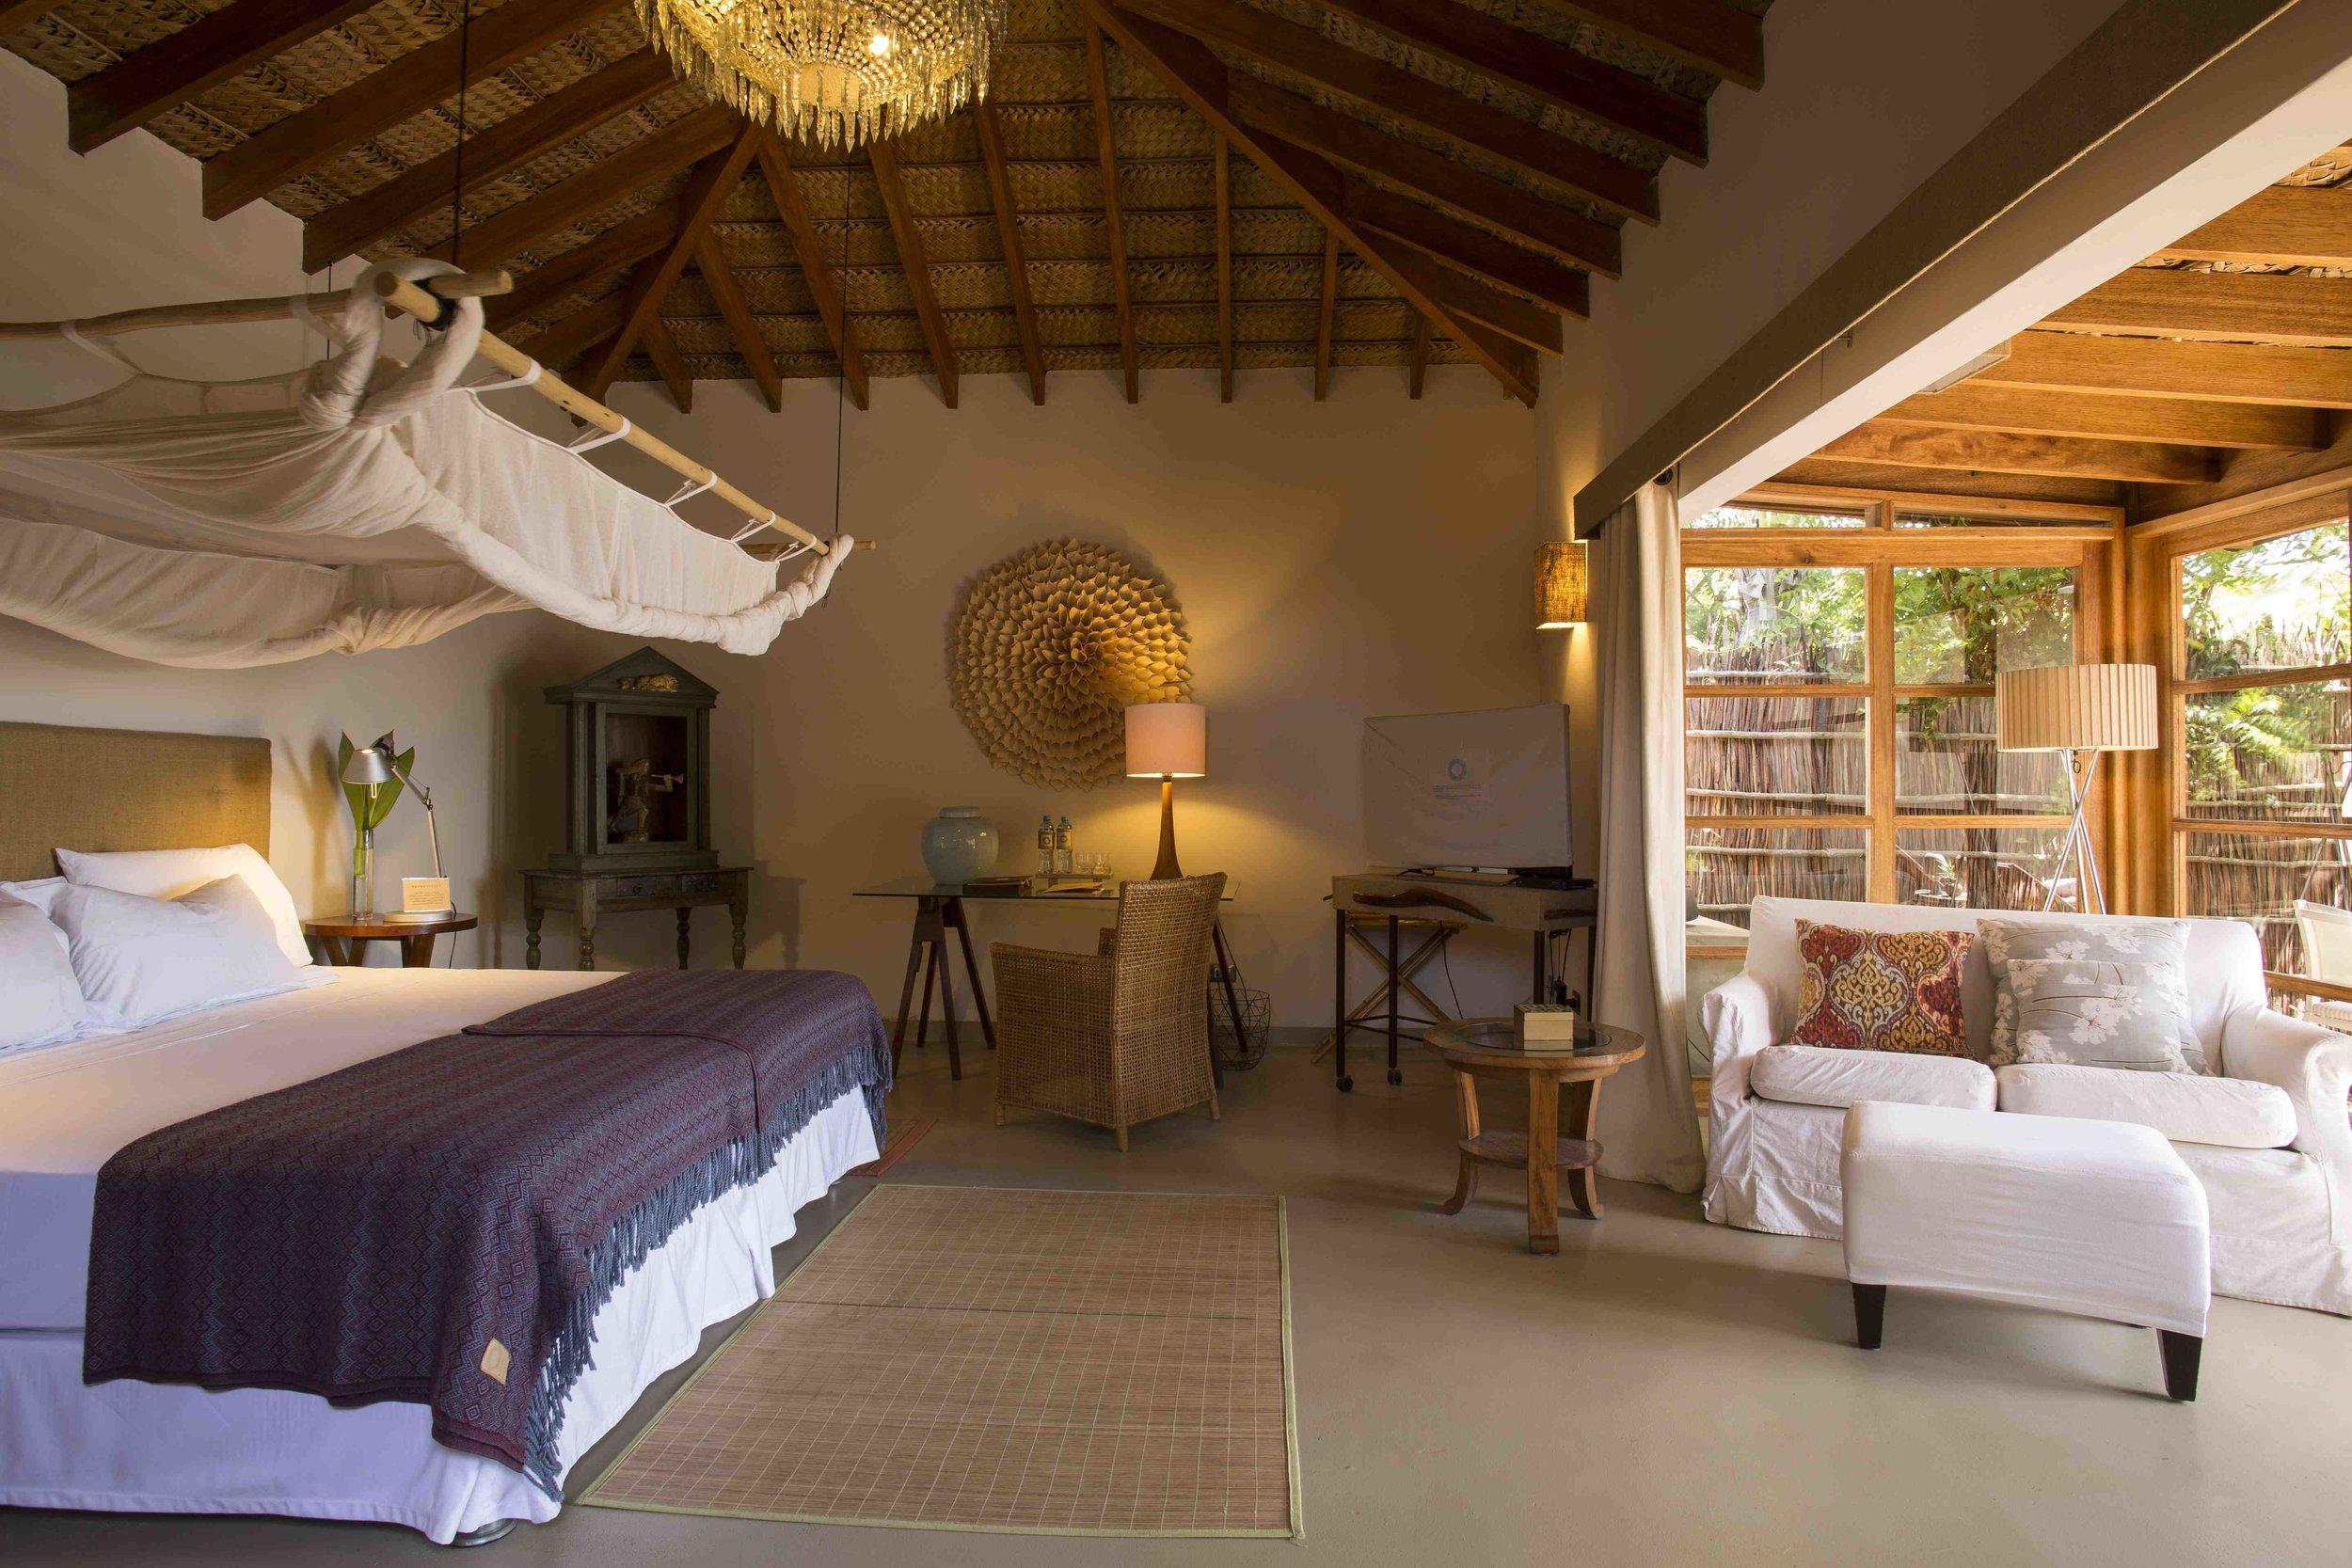 Kichic_yoga_retreat_bedroom__mancora_1.jpg